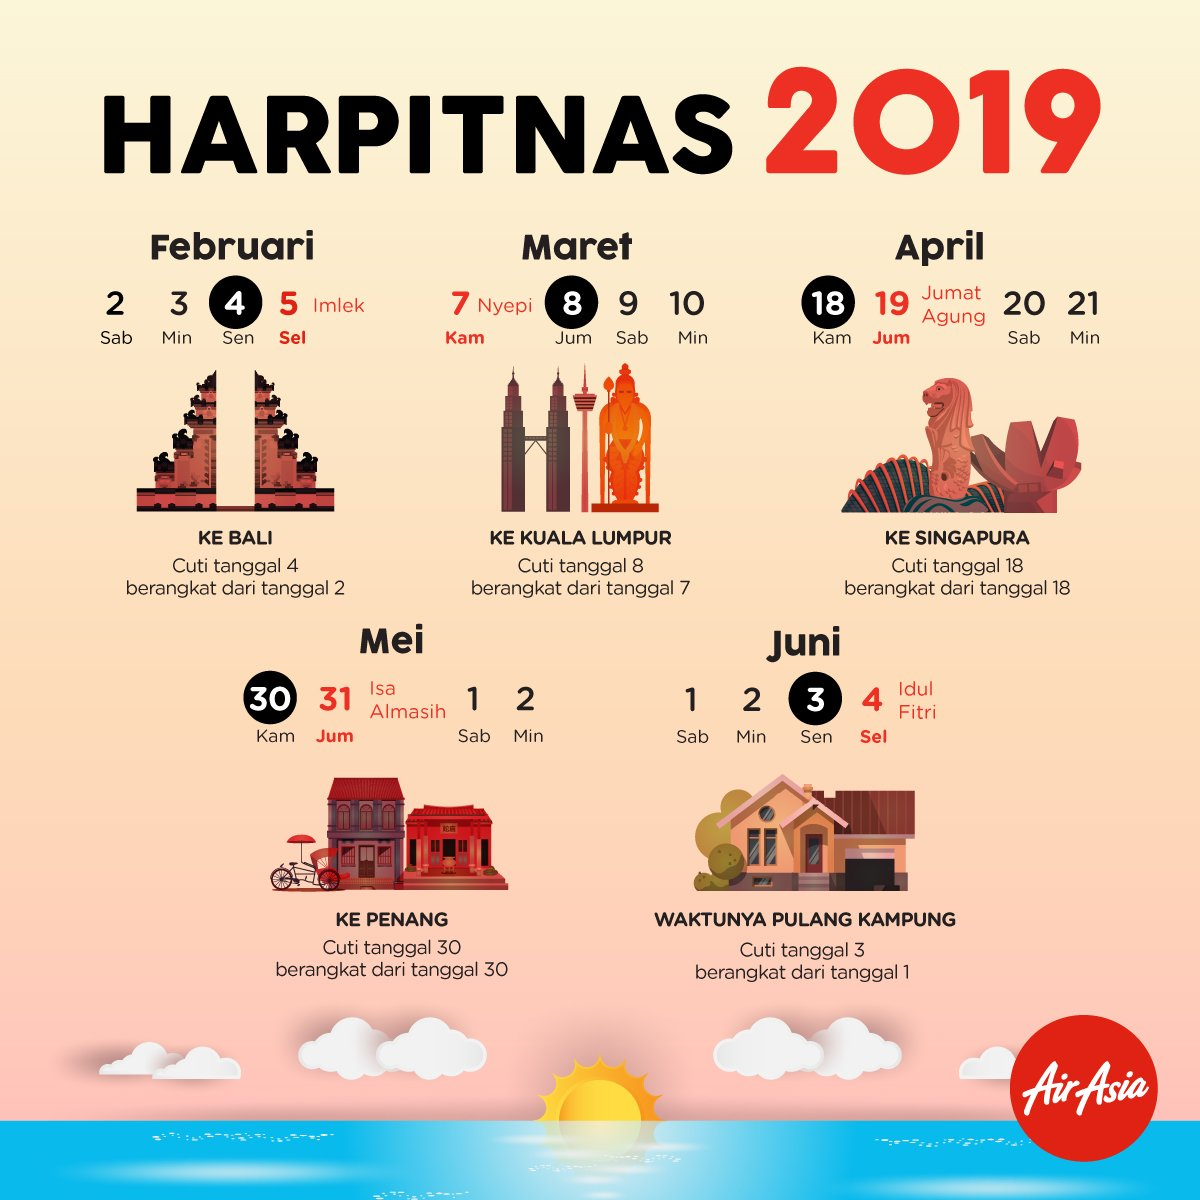 News - Info Kalender Harpitnas 2019